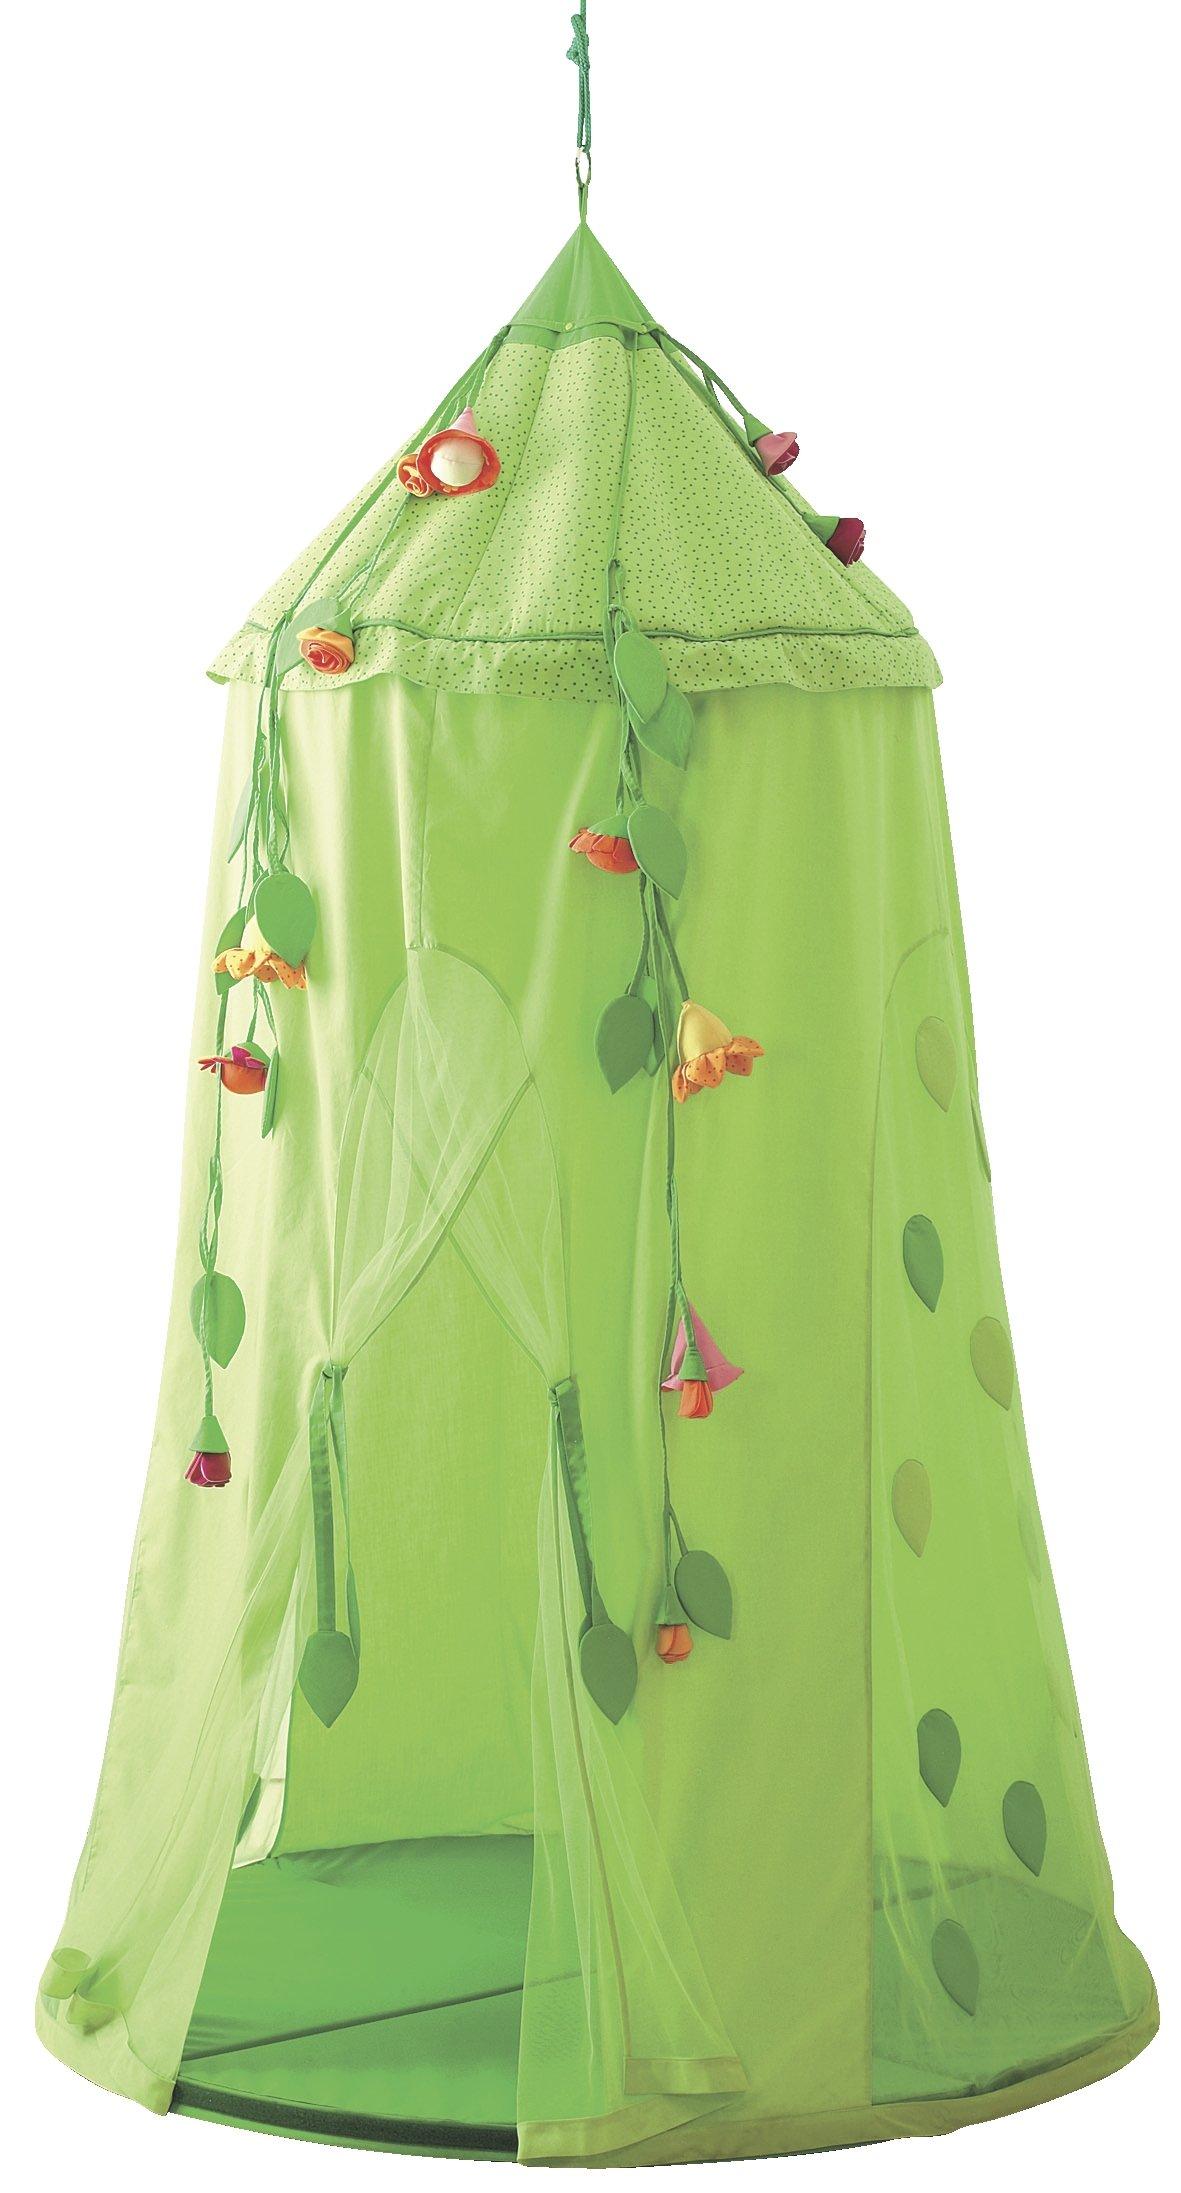 Haba Blossom Sky Room Tent